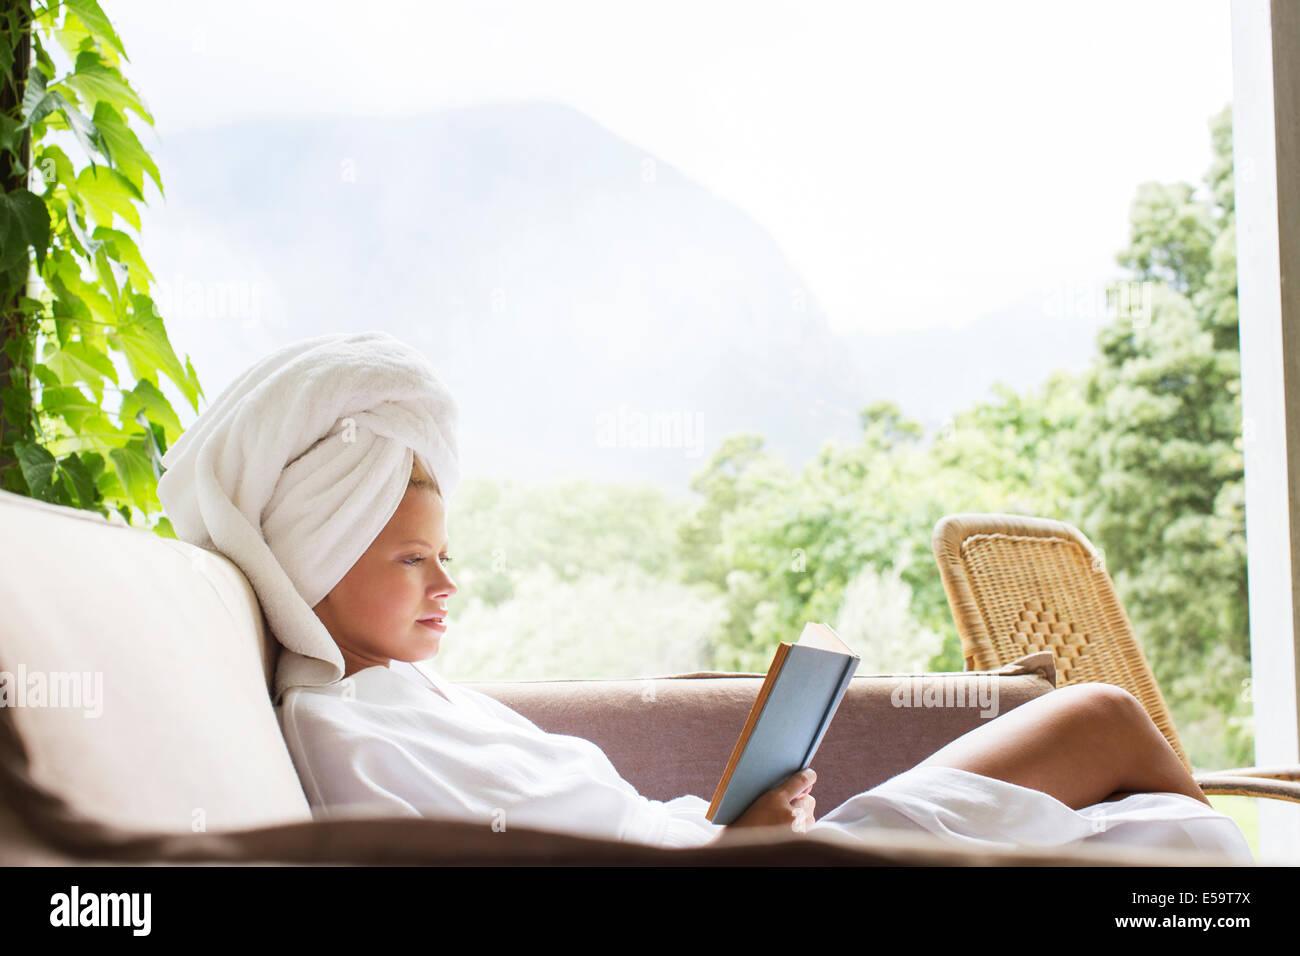 Frau im Bademantel auf dem Sofa lesen Stockbild